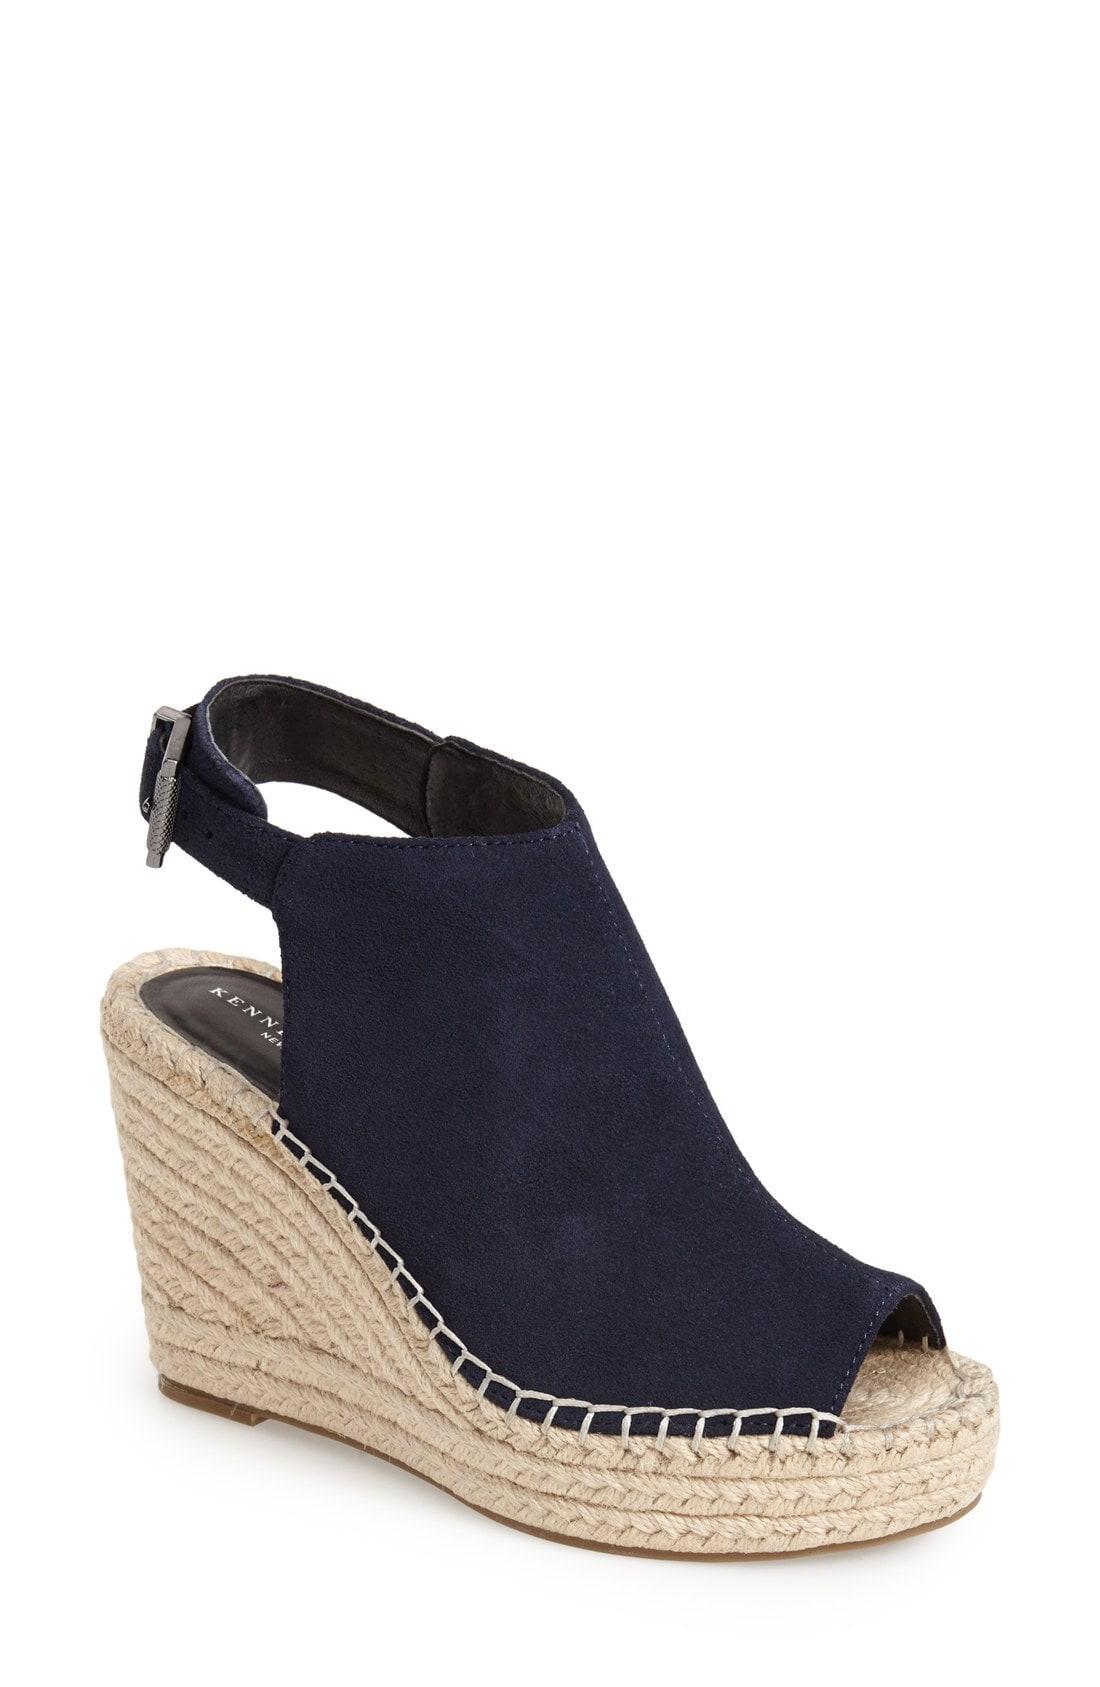 7e32f1cf4c41 Lyst - Kenneth Cole  olivia  Espadrille Wedge Sandal in Blue